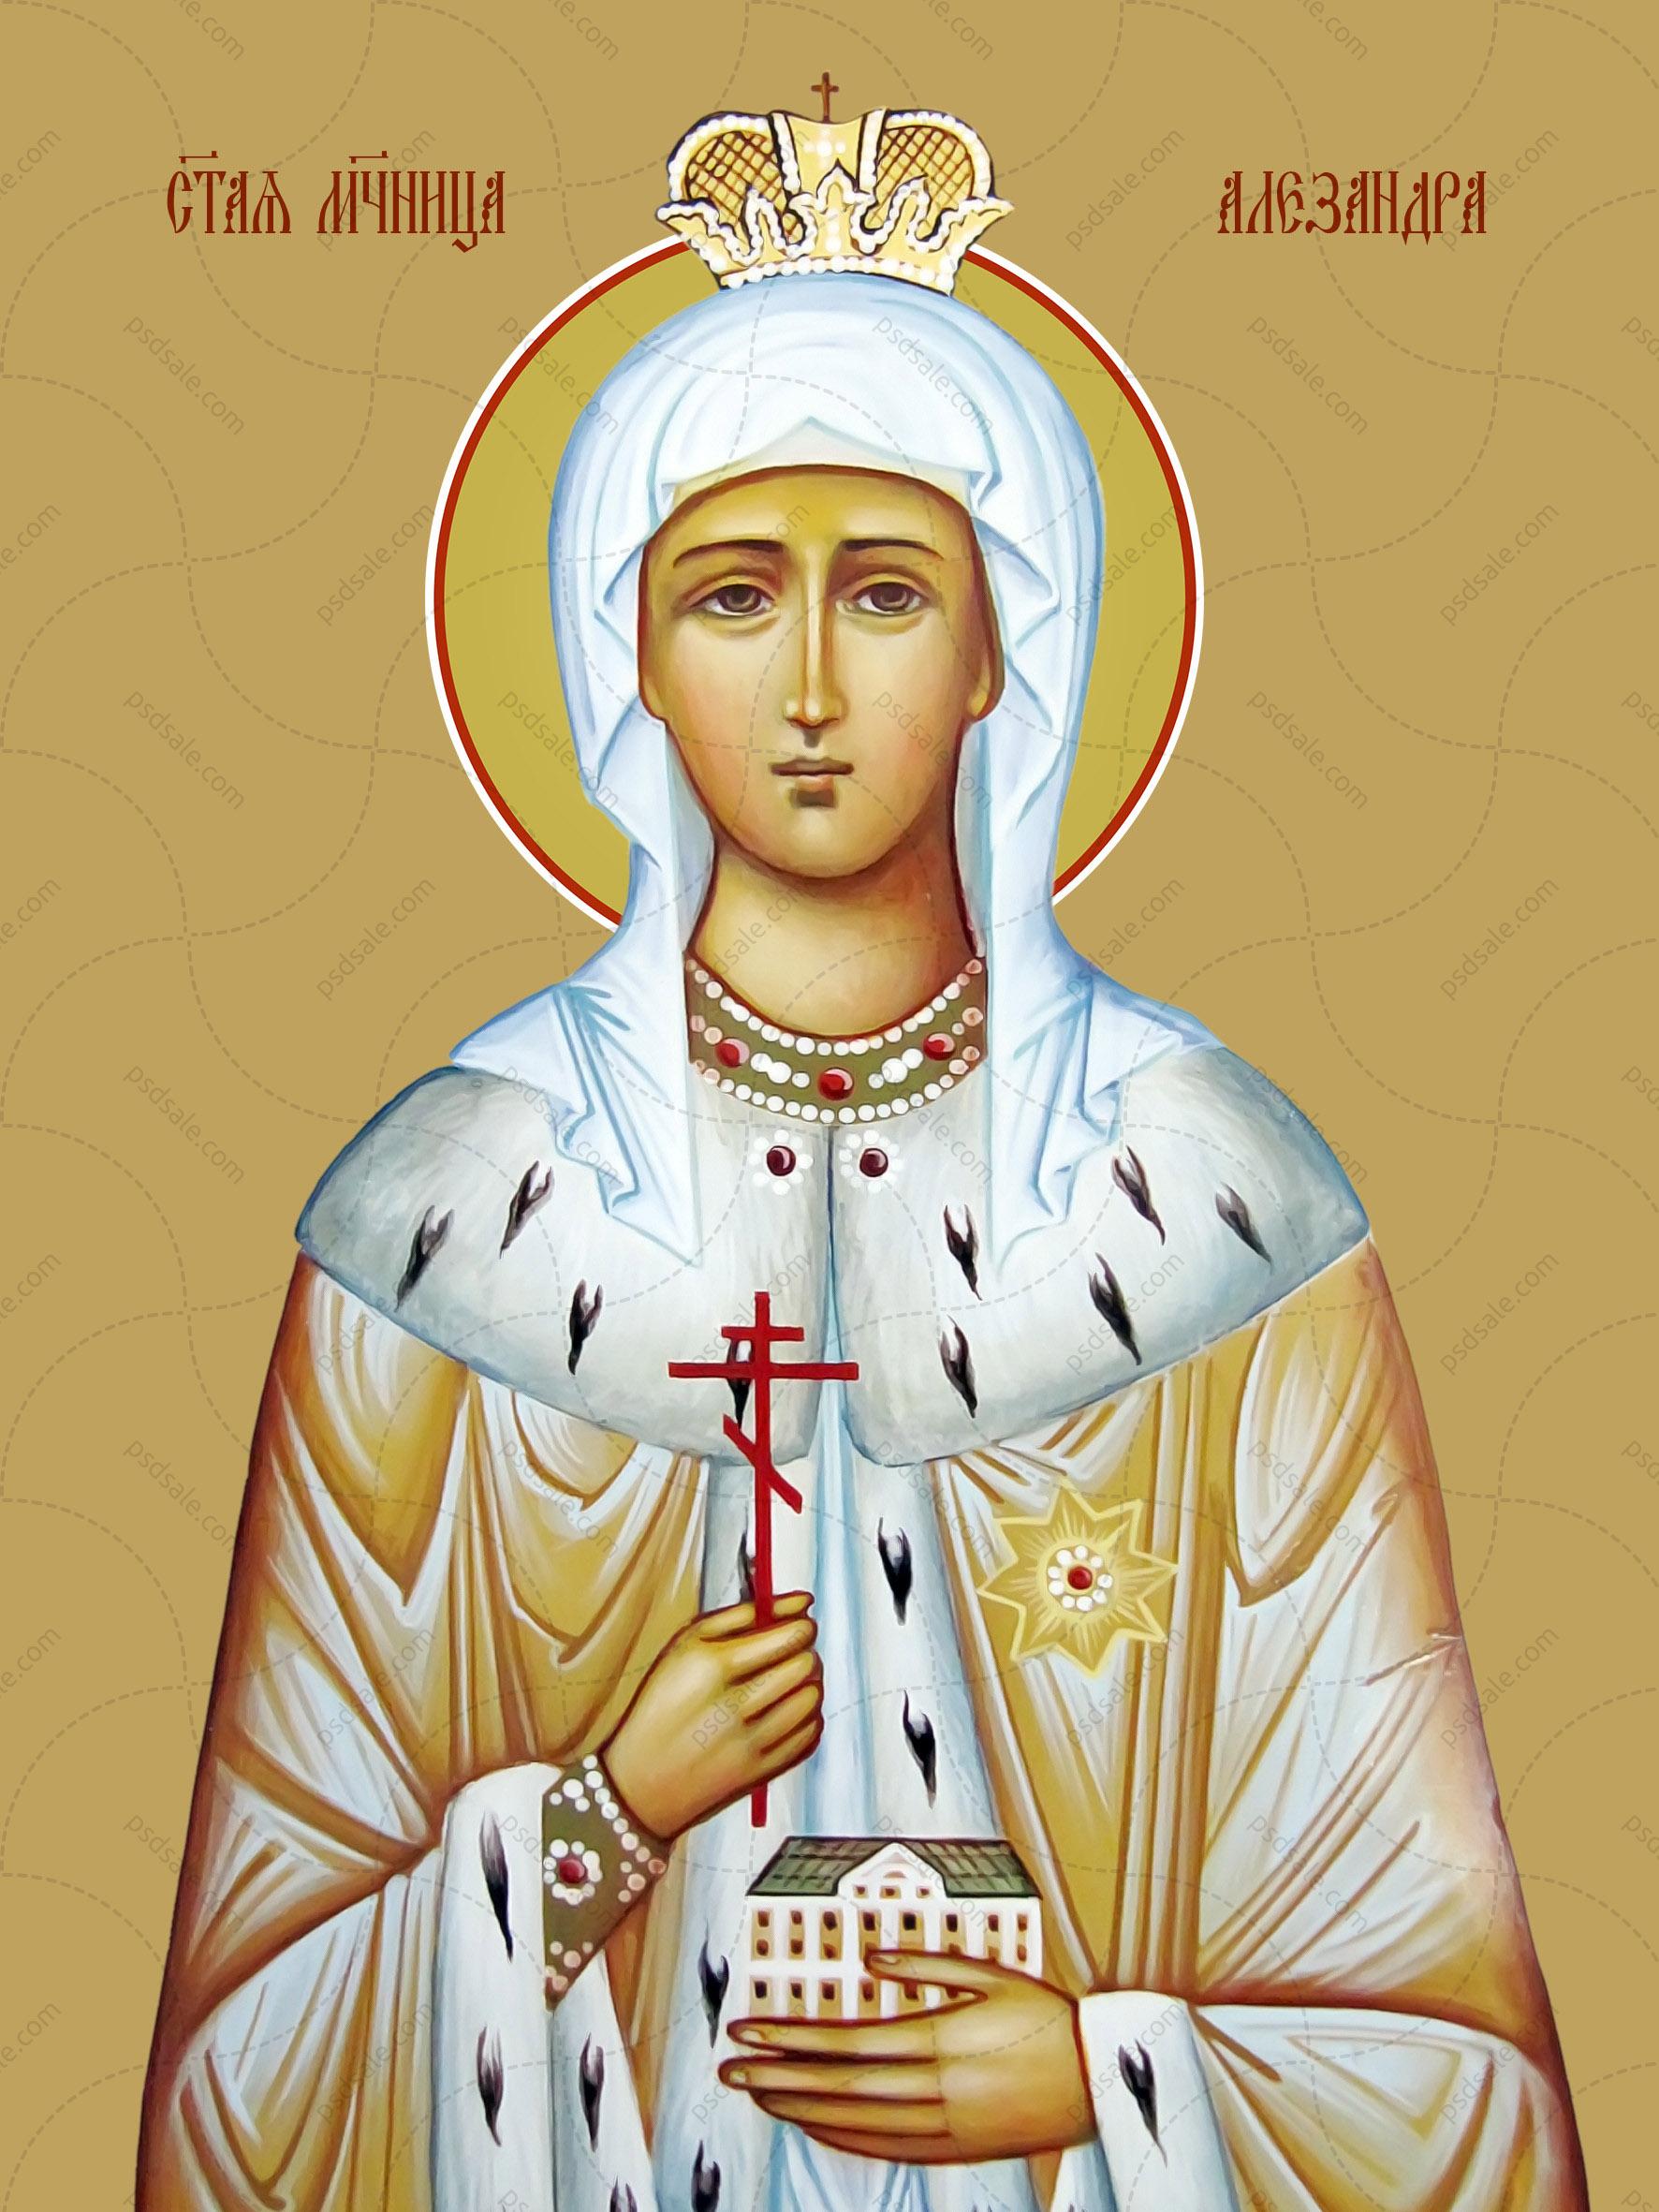 Александра, святая мученица